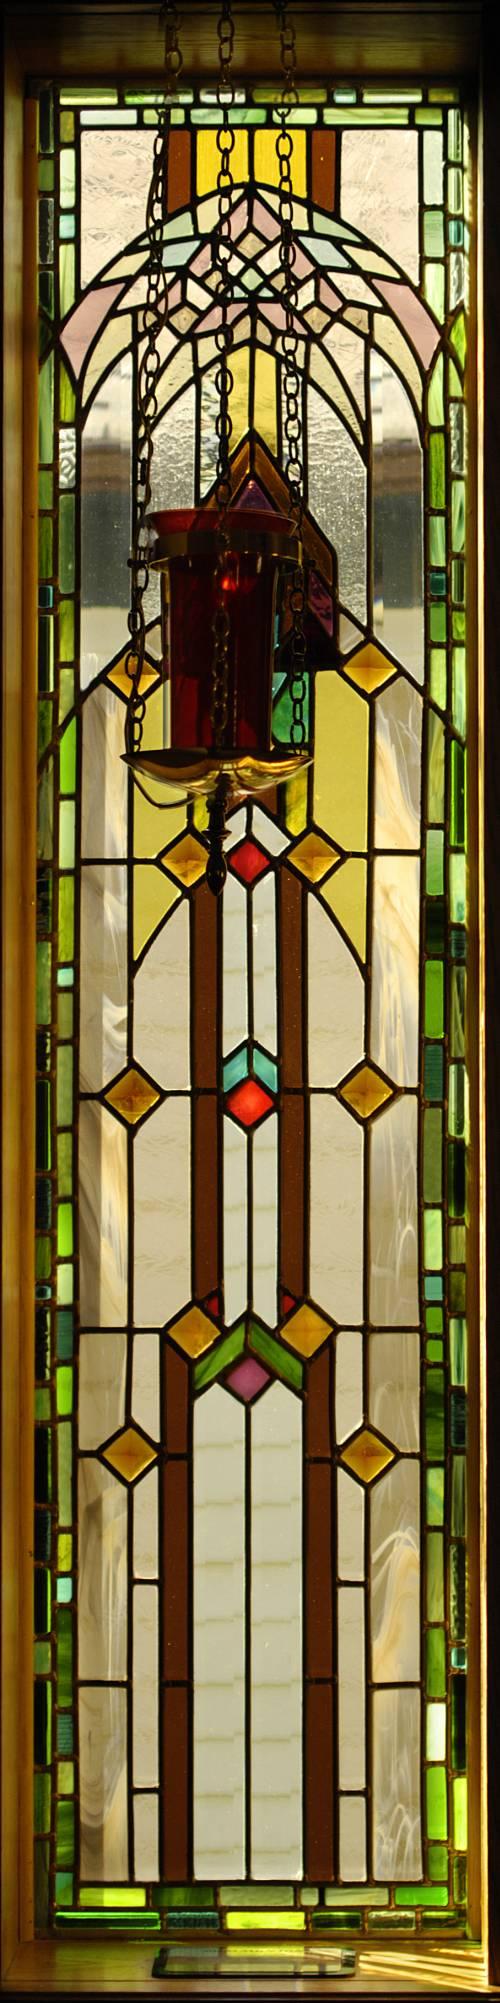 Window 4, Communion, with Lamp